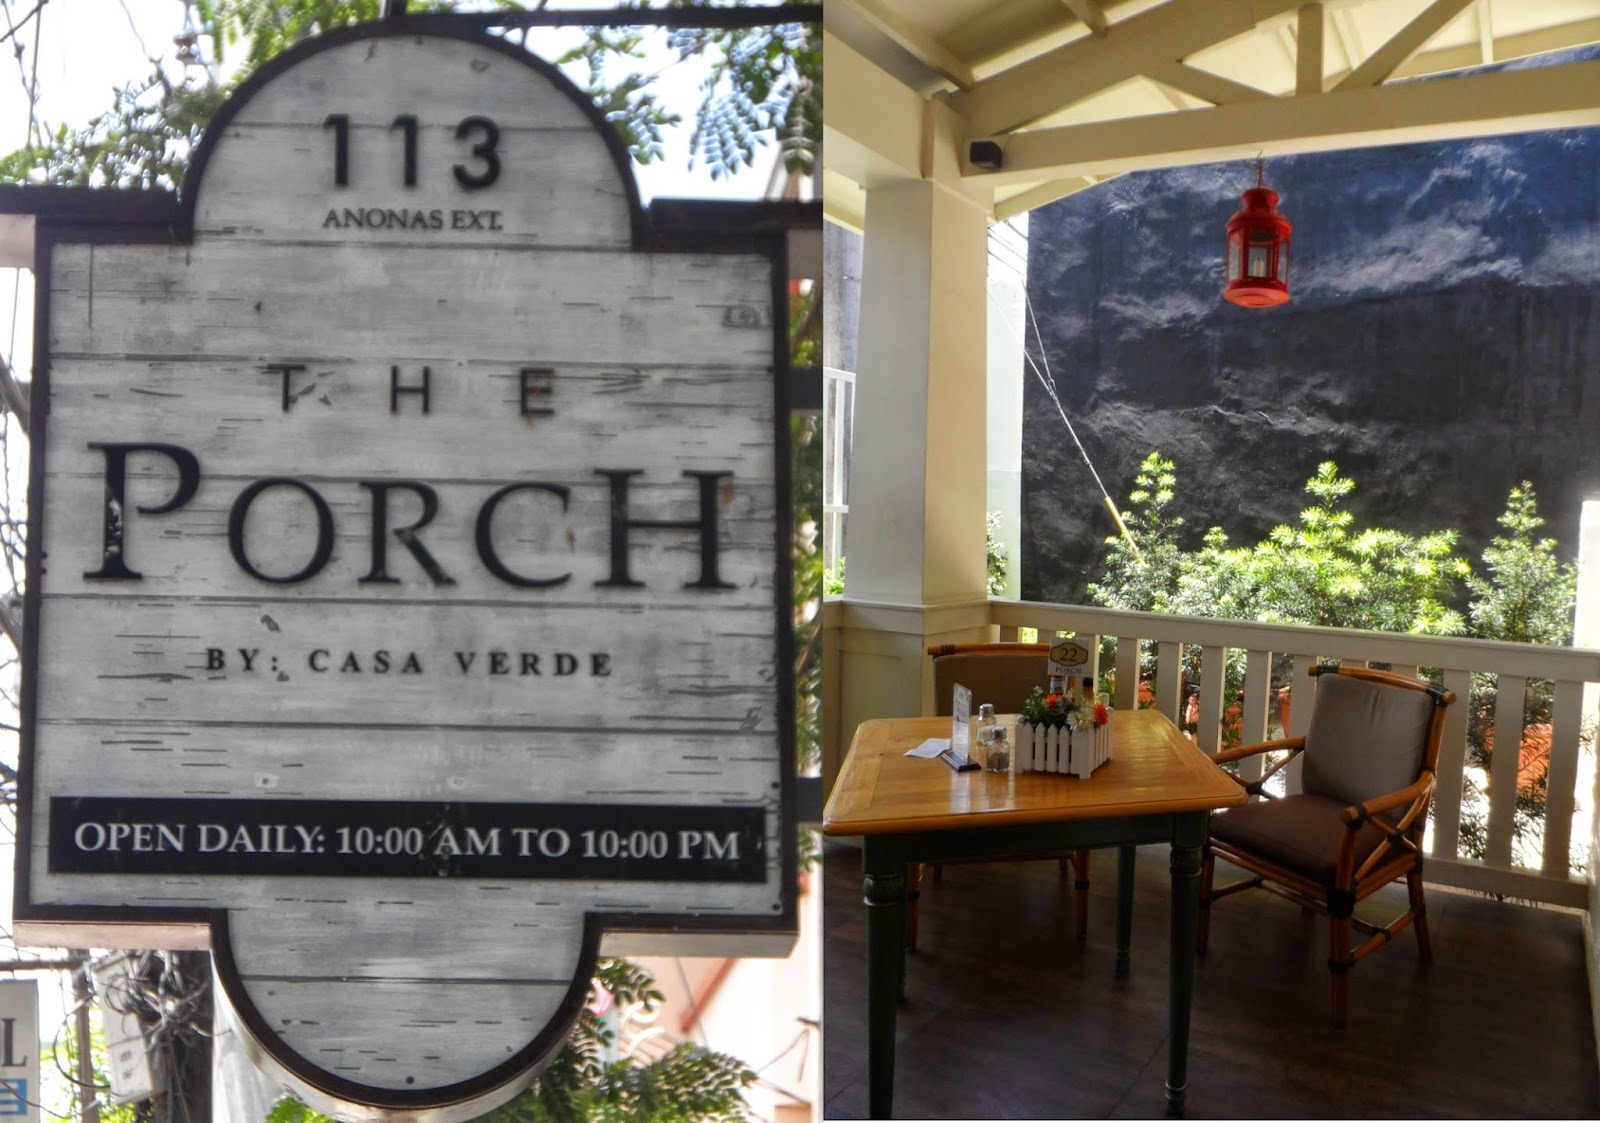 The porch restaurant by casa verde